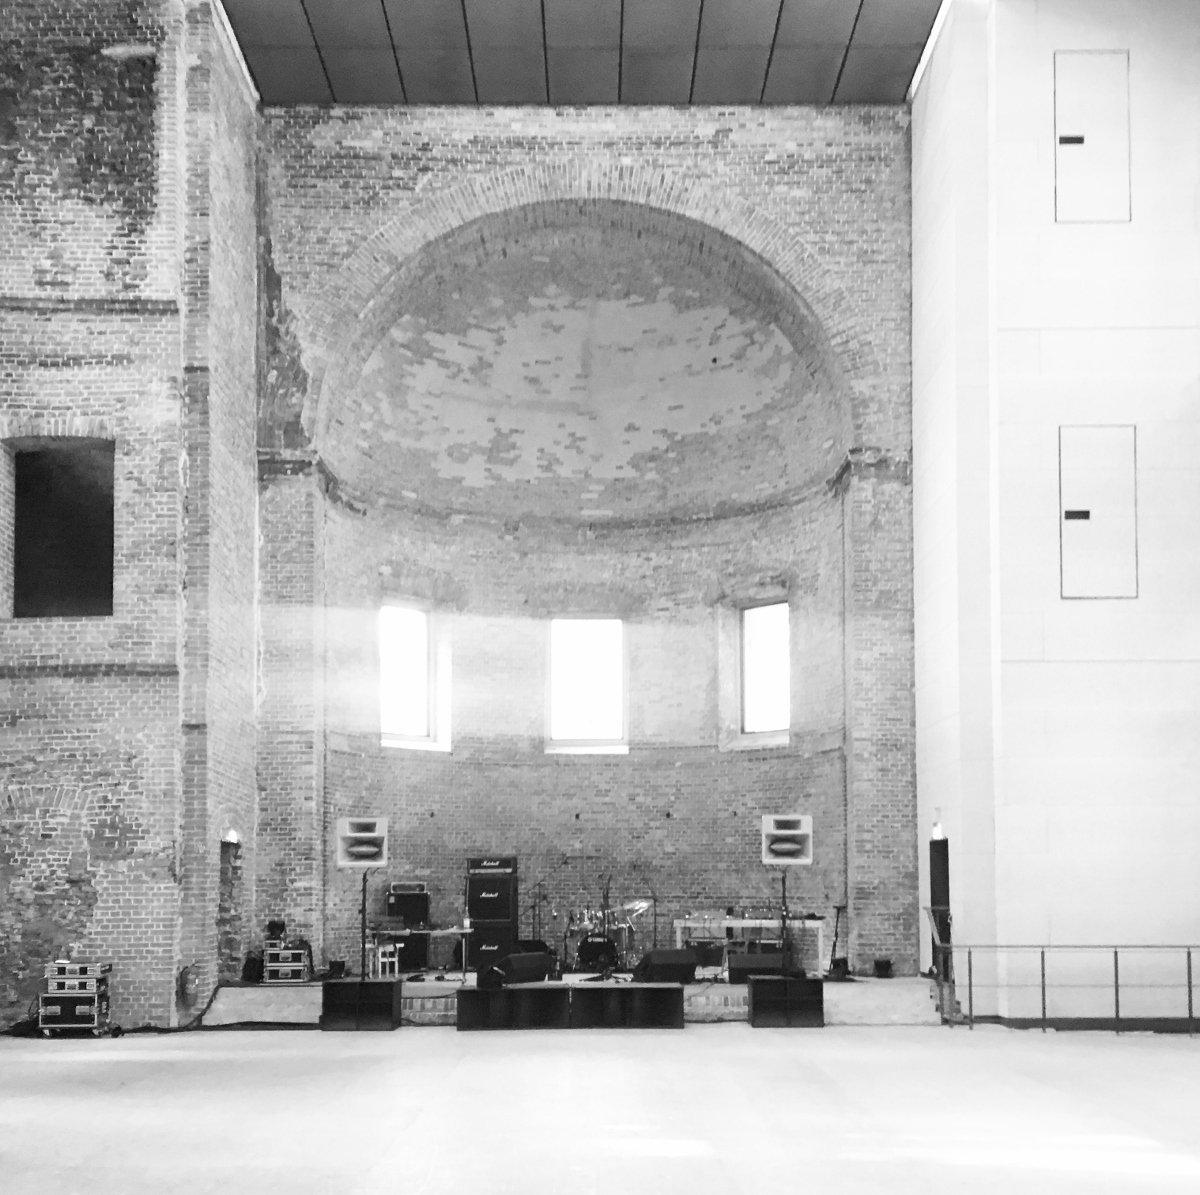 St. Elisabeth-Kirche, Berlino, photo Carlotta Petracci